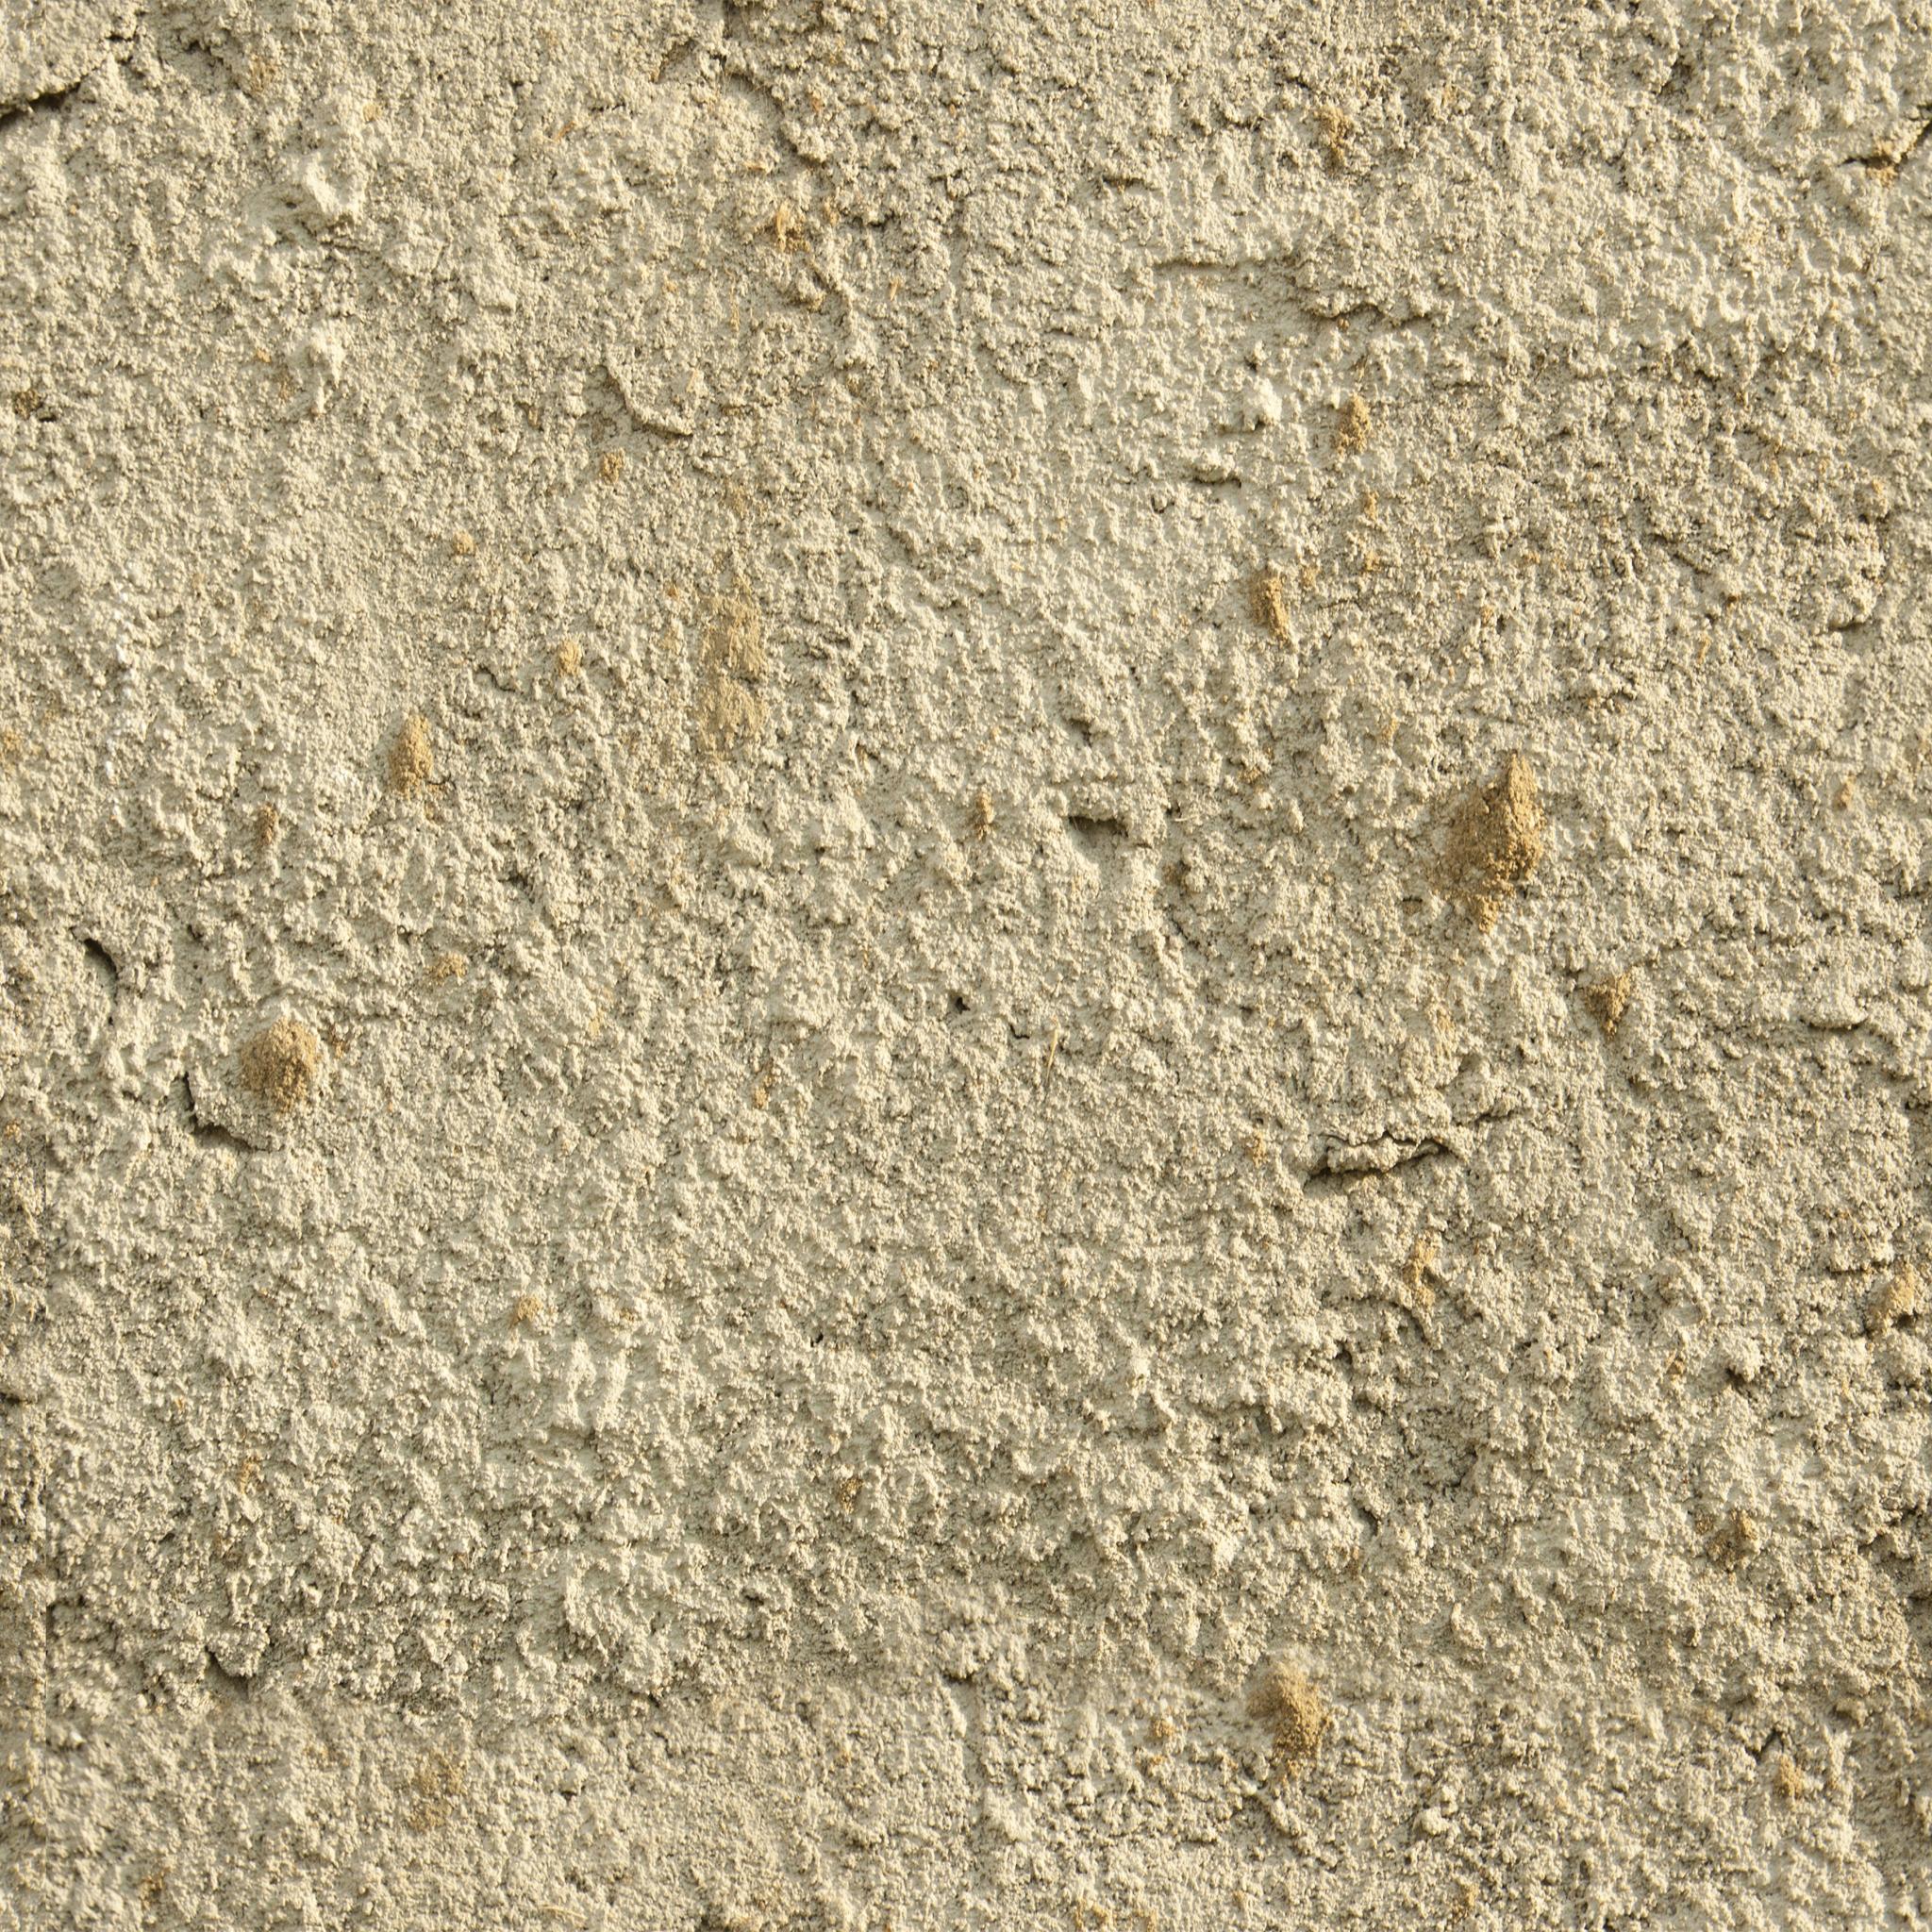 Brown Course Worn Stucco.jpg